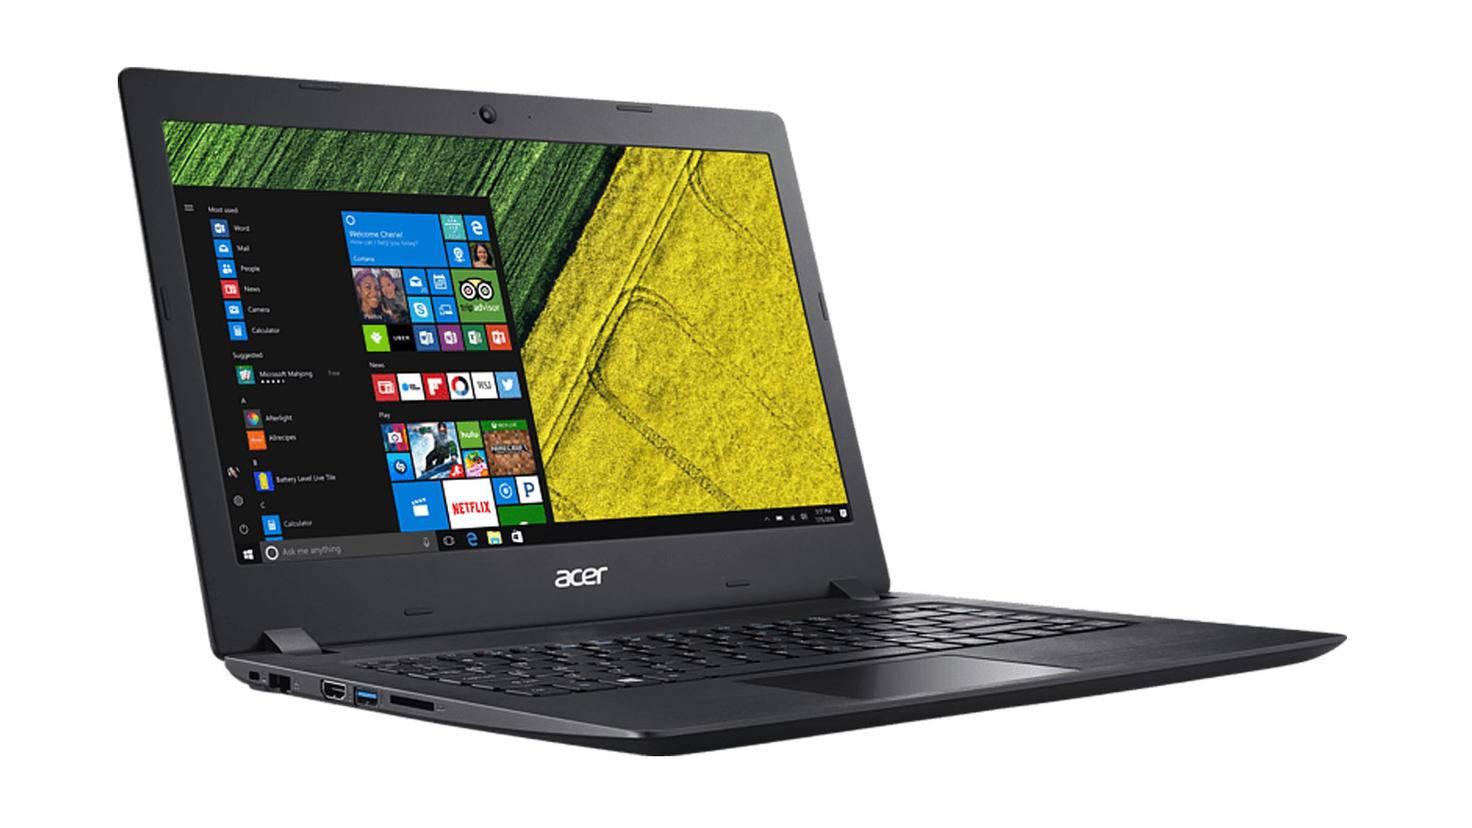 Notebook Laptop Acer Aspire 1